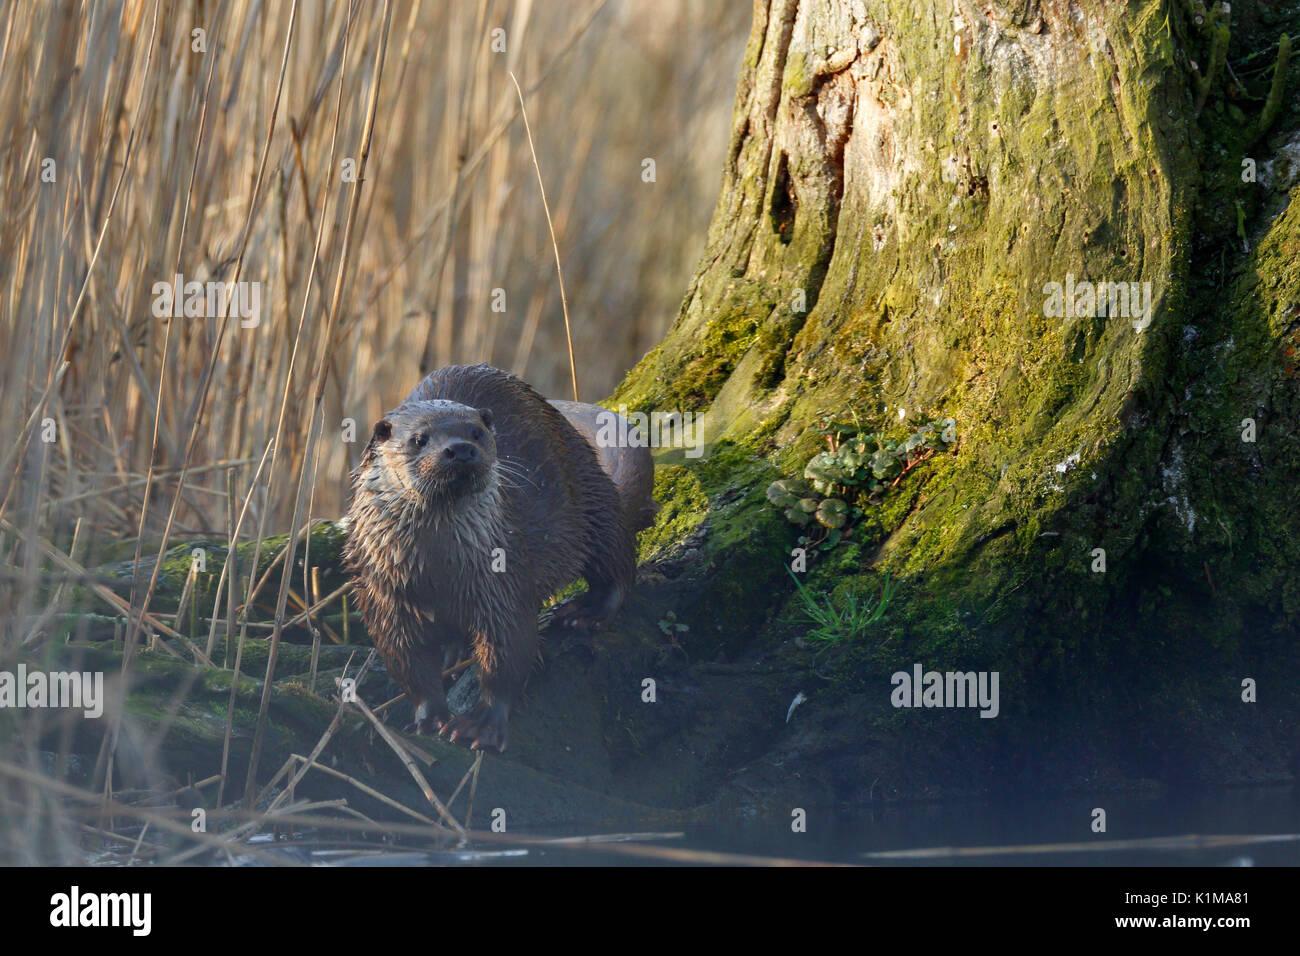 European otter (Lutra lutra) next to deadwood tree, Naturpark Flusslandschaft Peenetal, Mecklenburg-Western Pomerania, - Stock Image